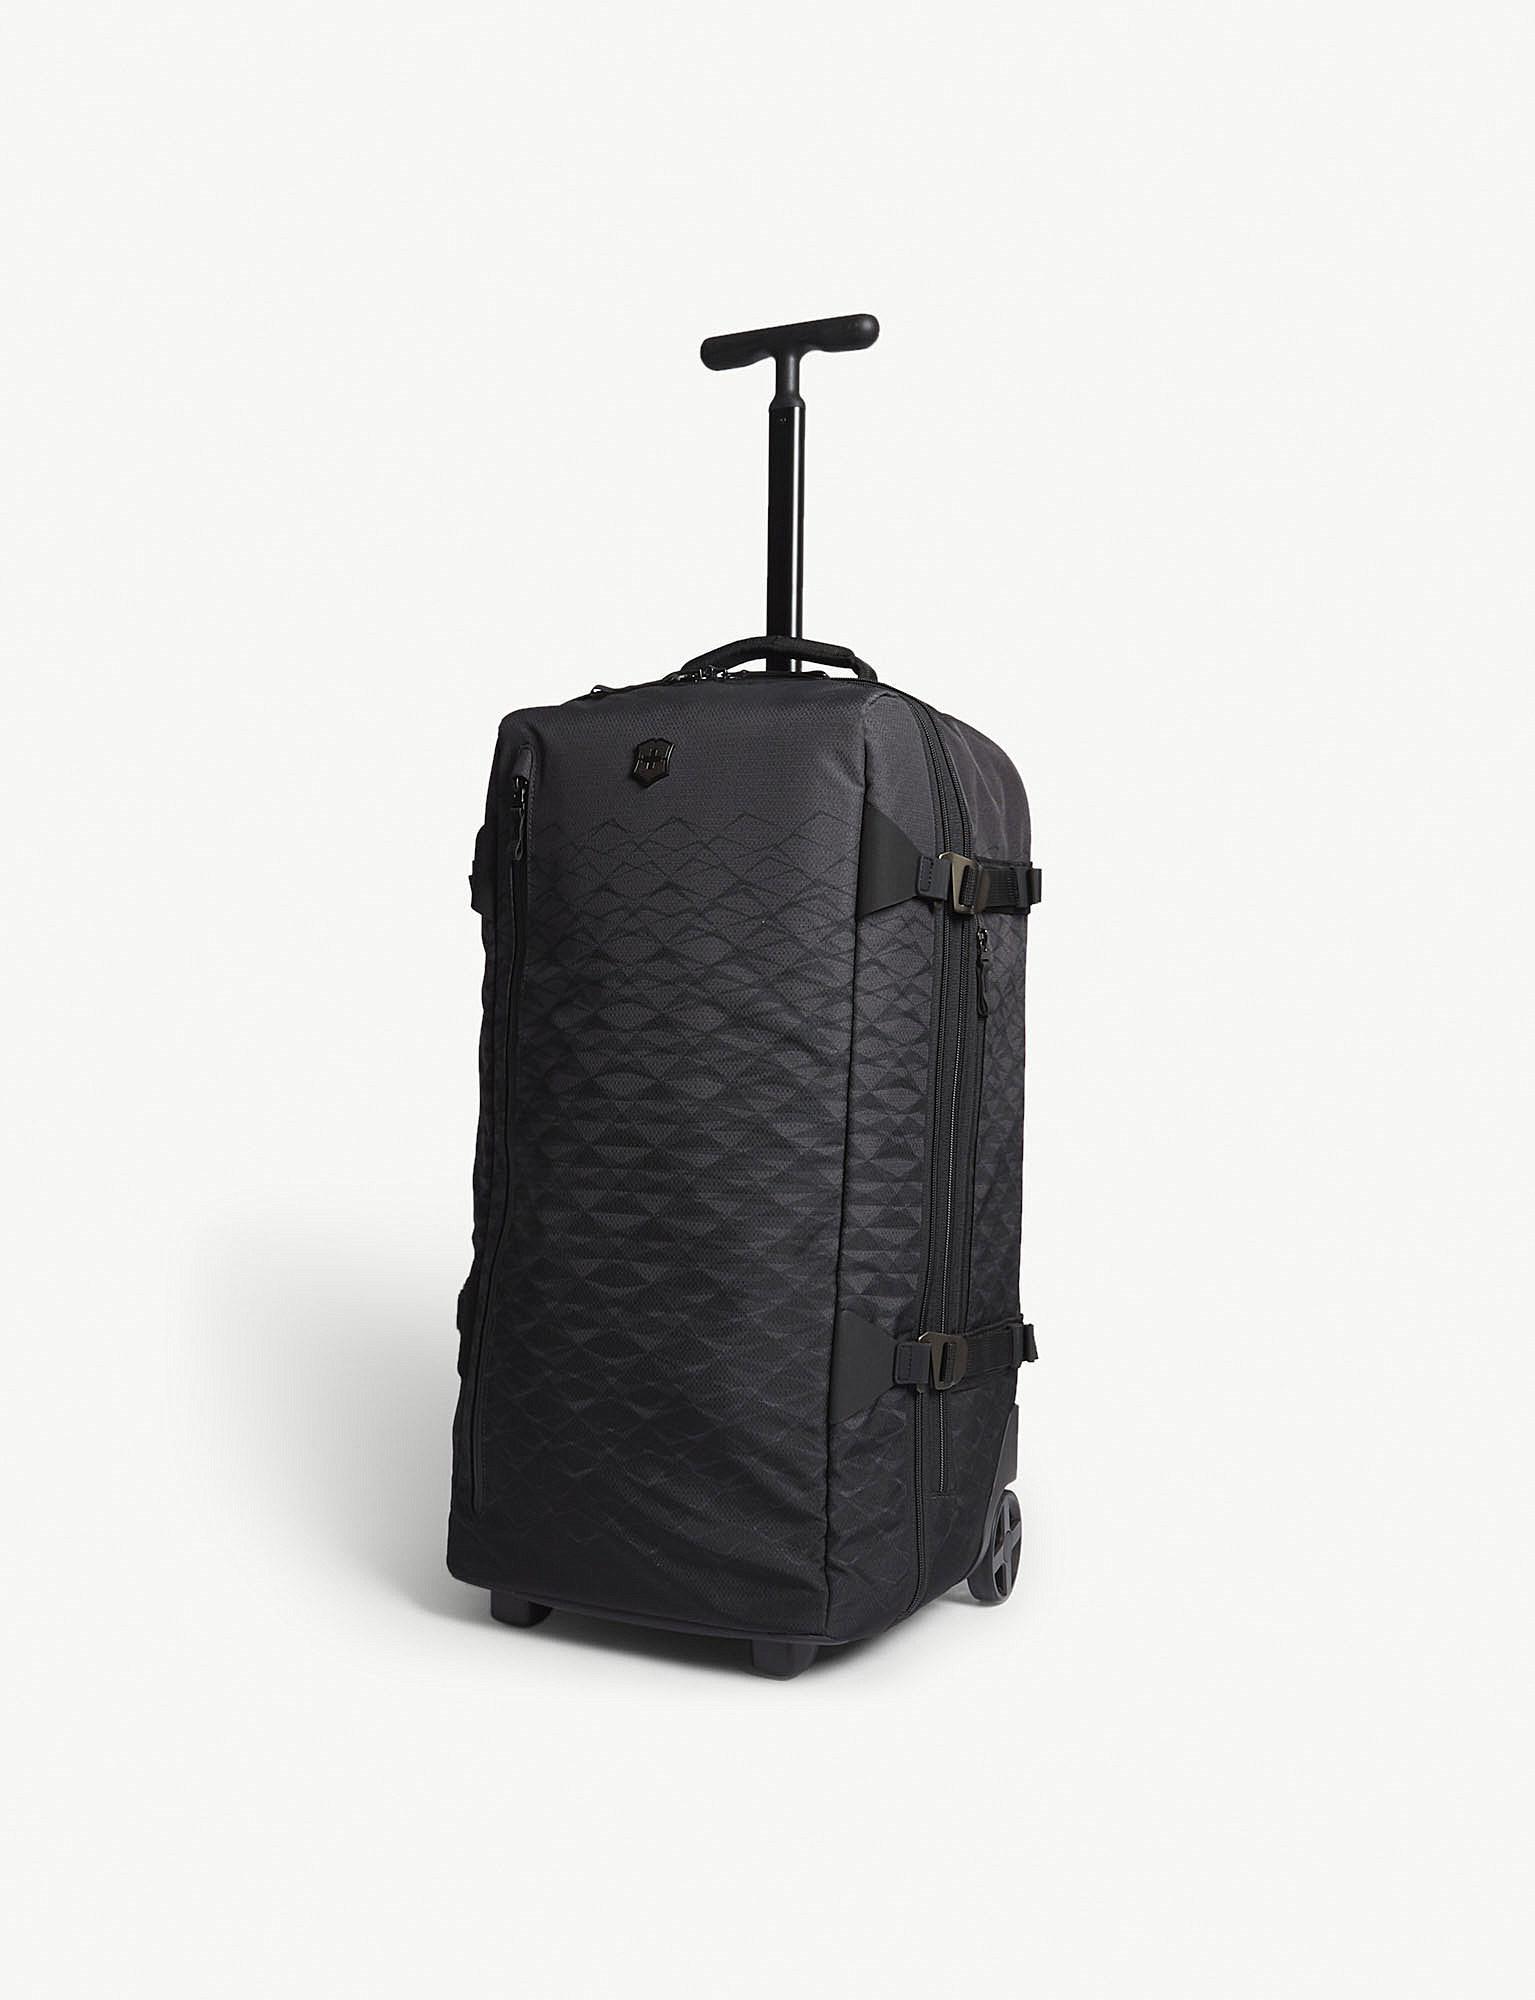 Lyst - Victorinox Vx Touring Two-wheel Duffle Bag 65cm in Black 1c6d3d2d58